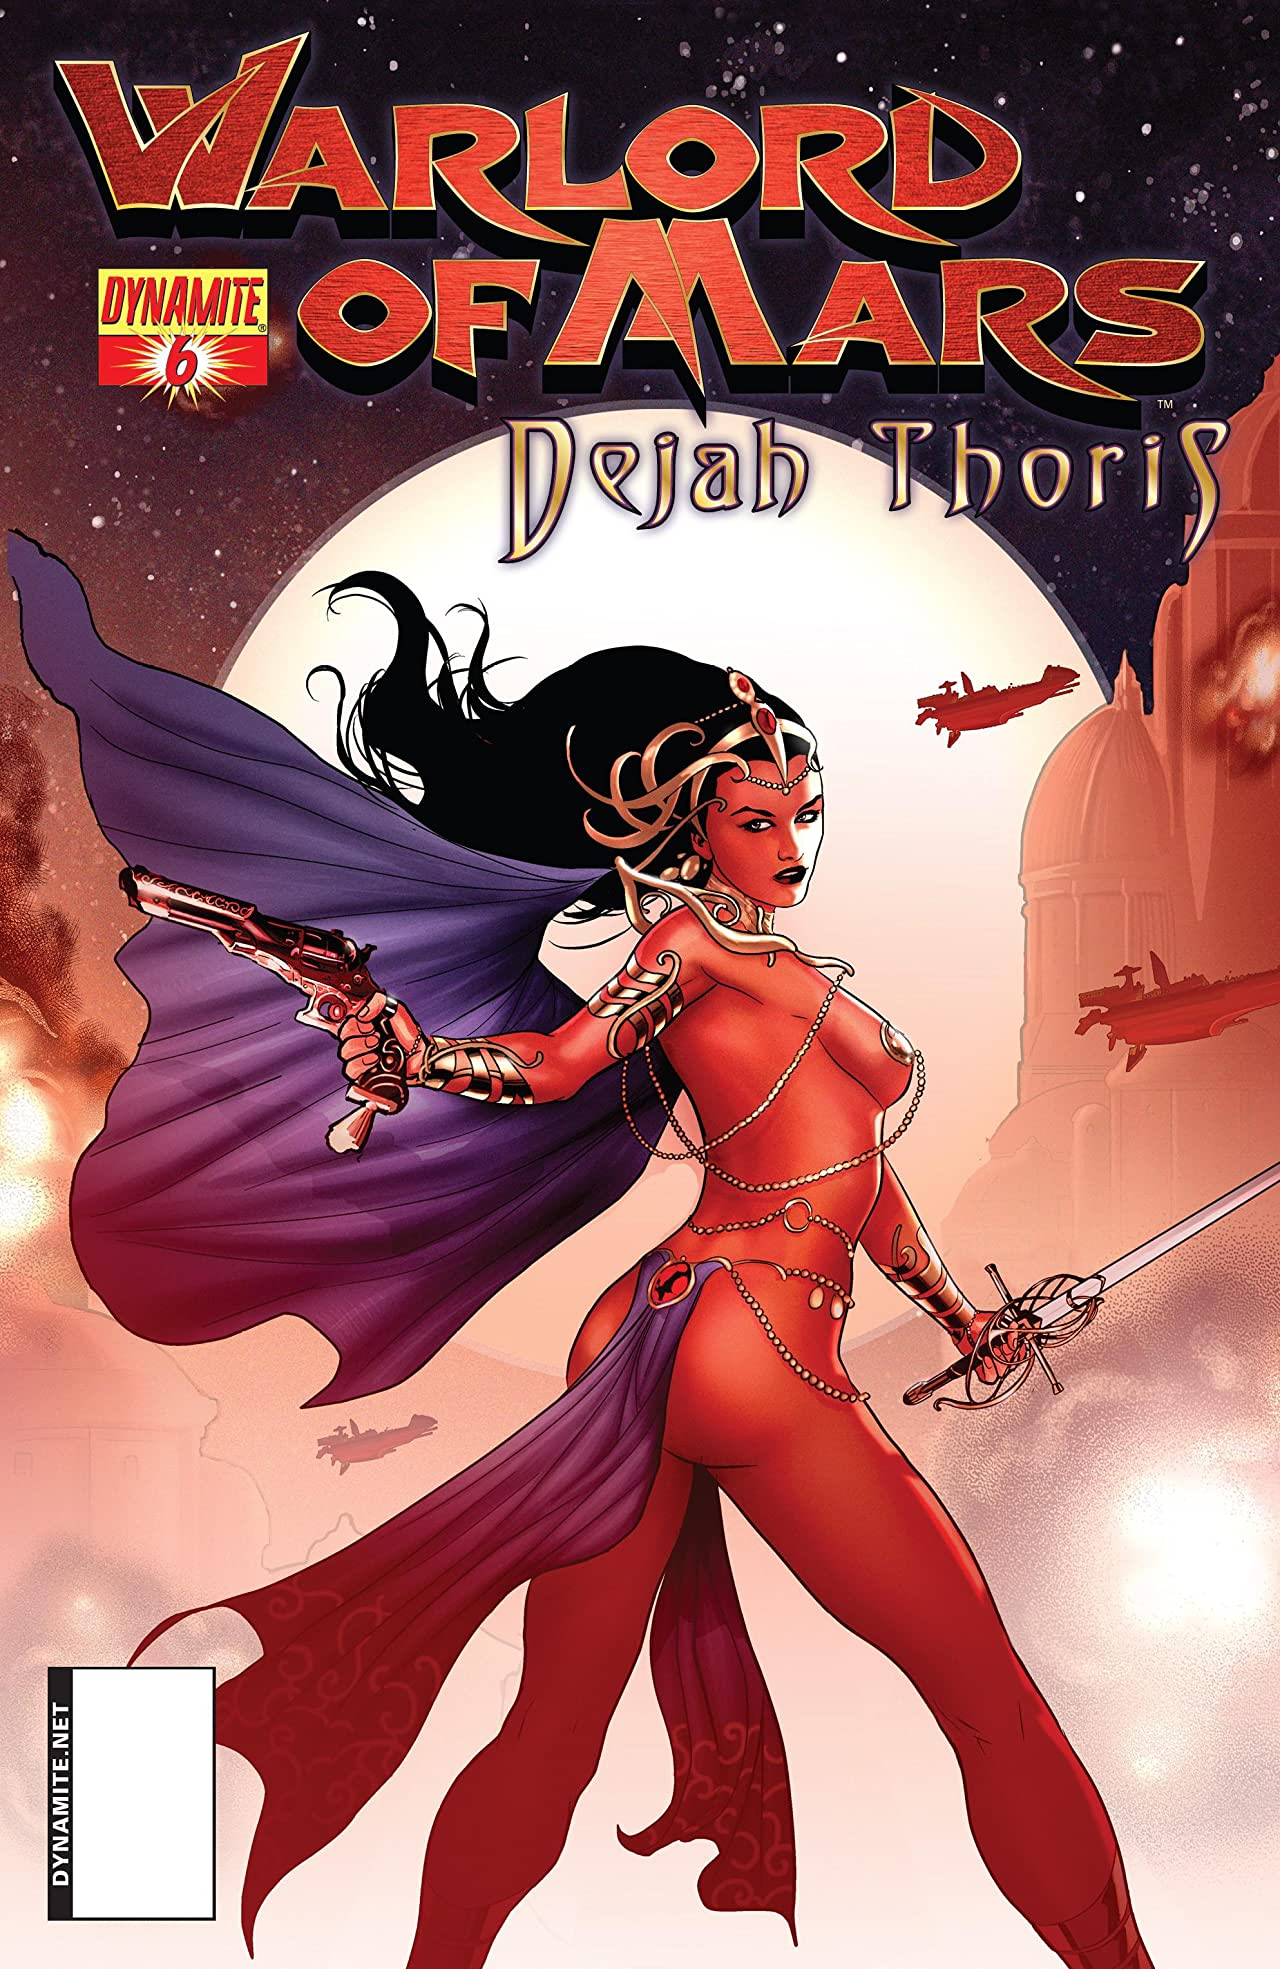 Warlord of Mars: Dejah Thoris #6